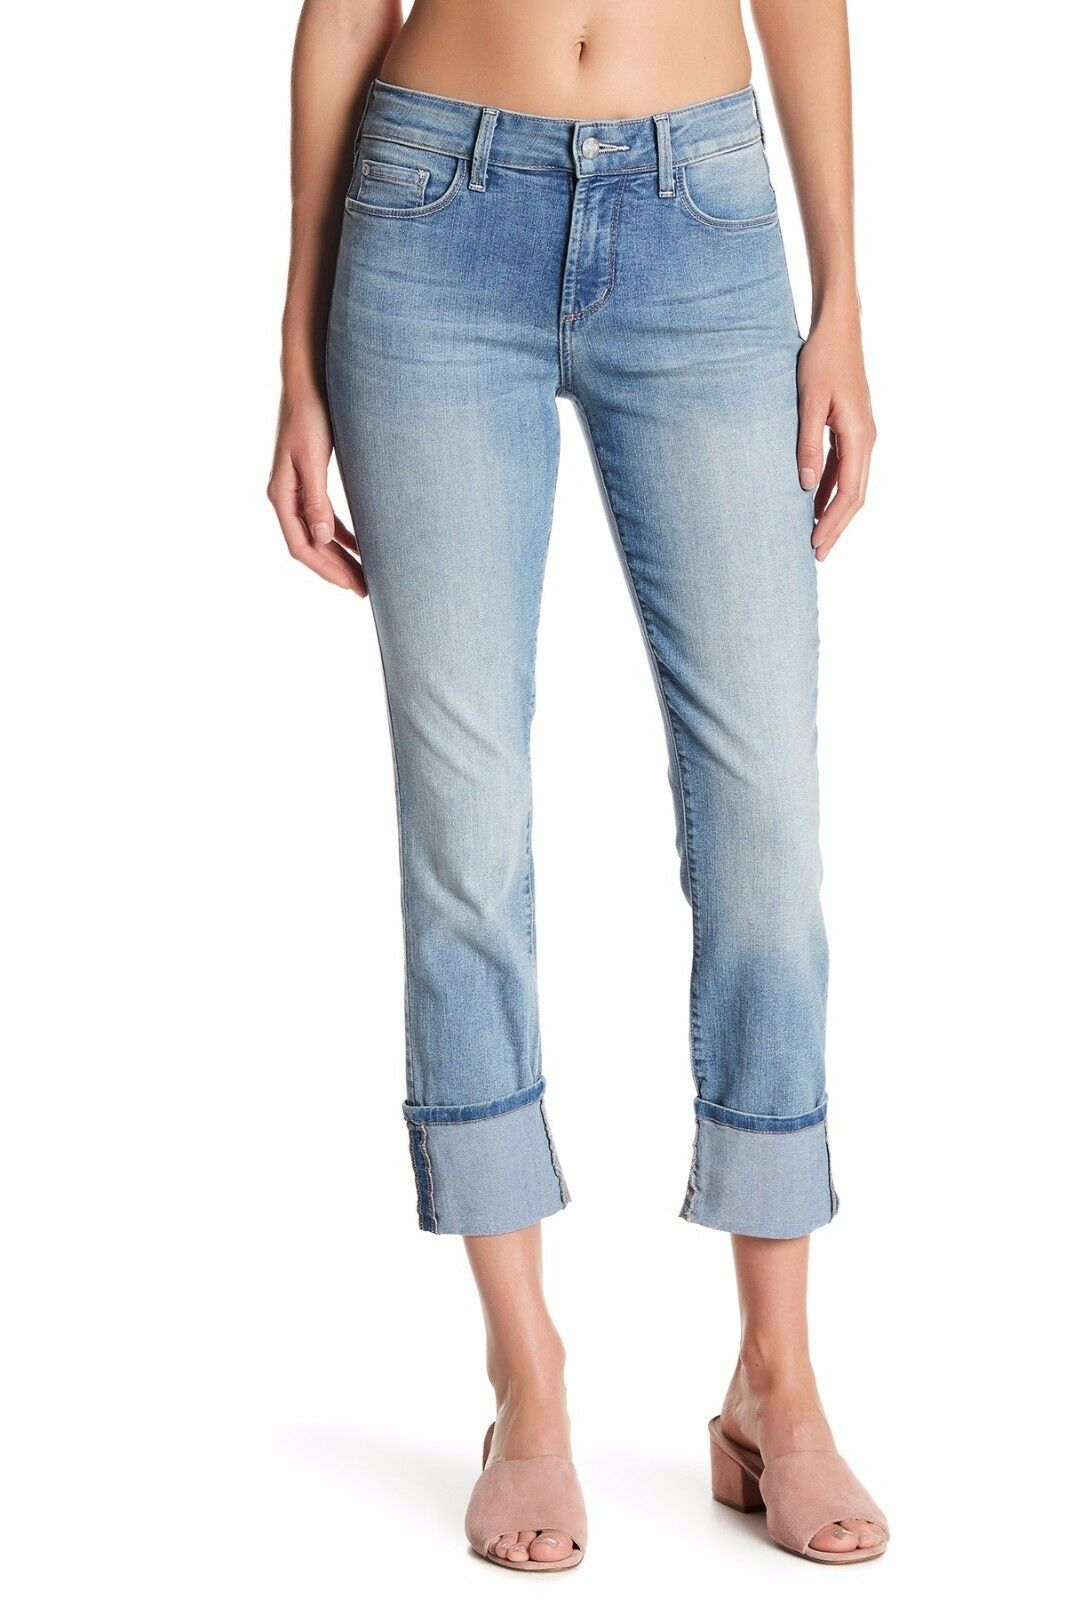 NWT NYDJ Lorena Cuffed Slim Boyfriend High Rise Jeans in Manhattan Beach 6